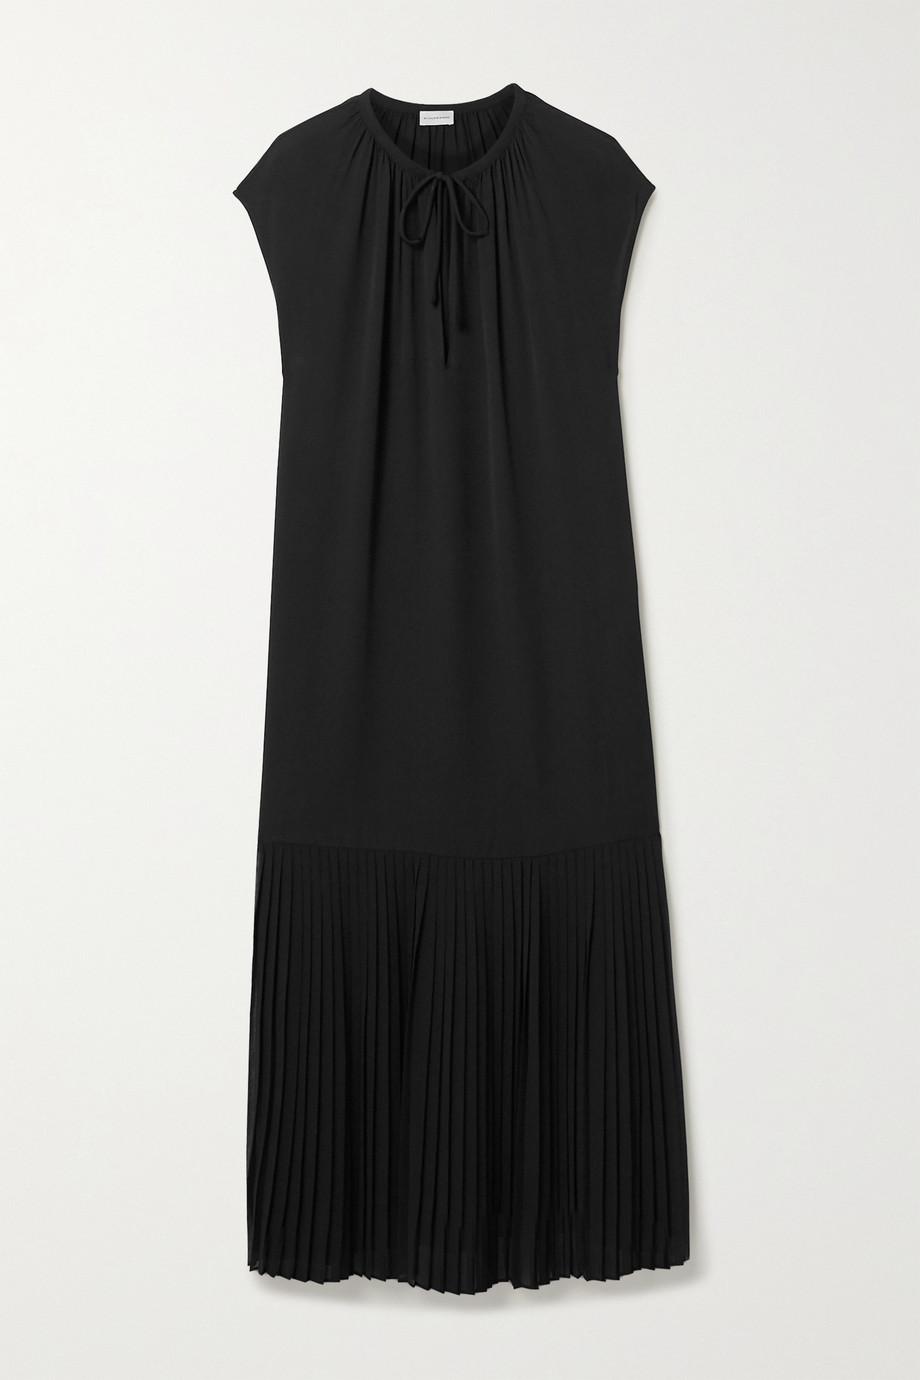 By Malene Birger Solomon pleated crepe midi dress